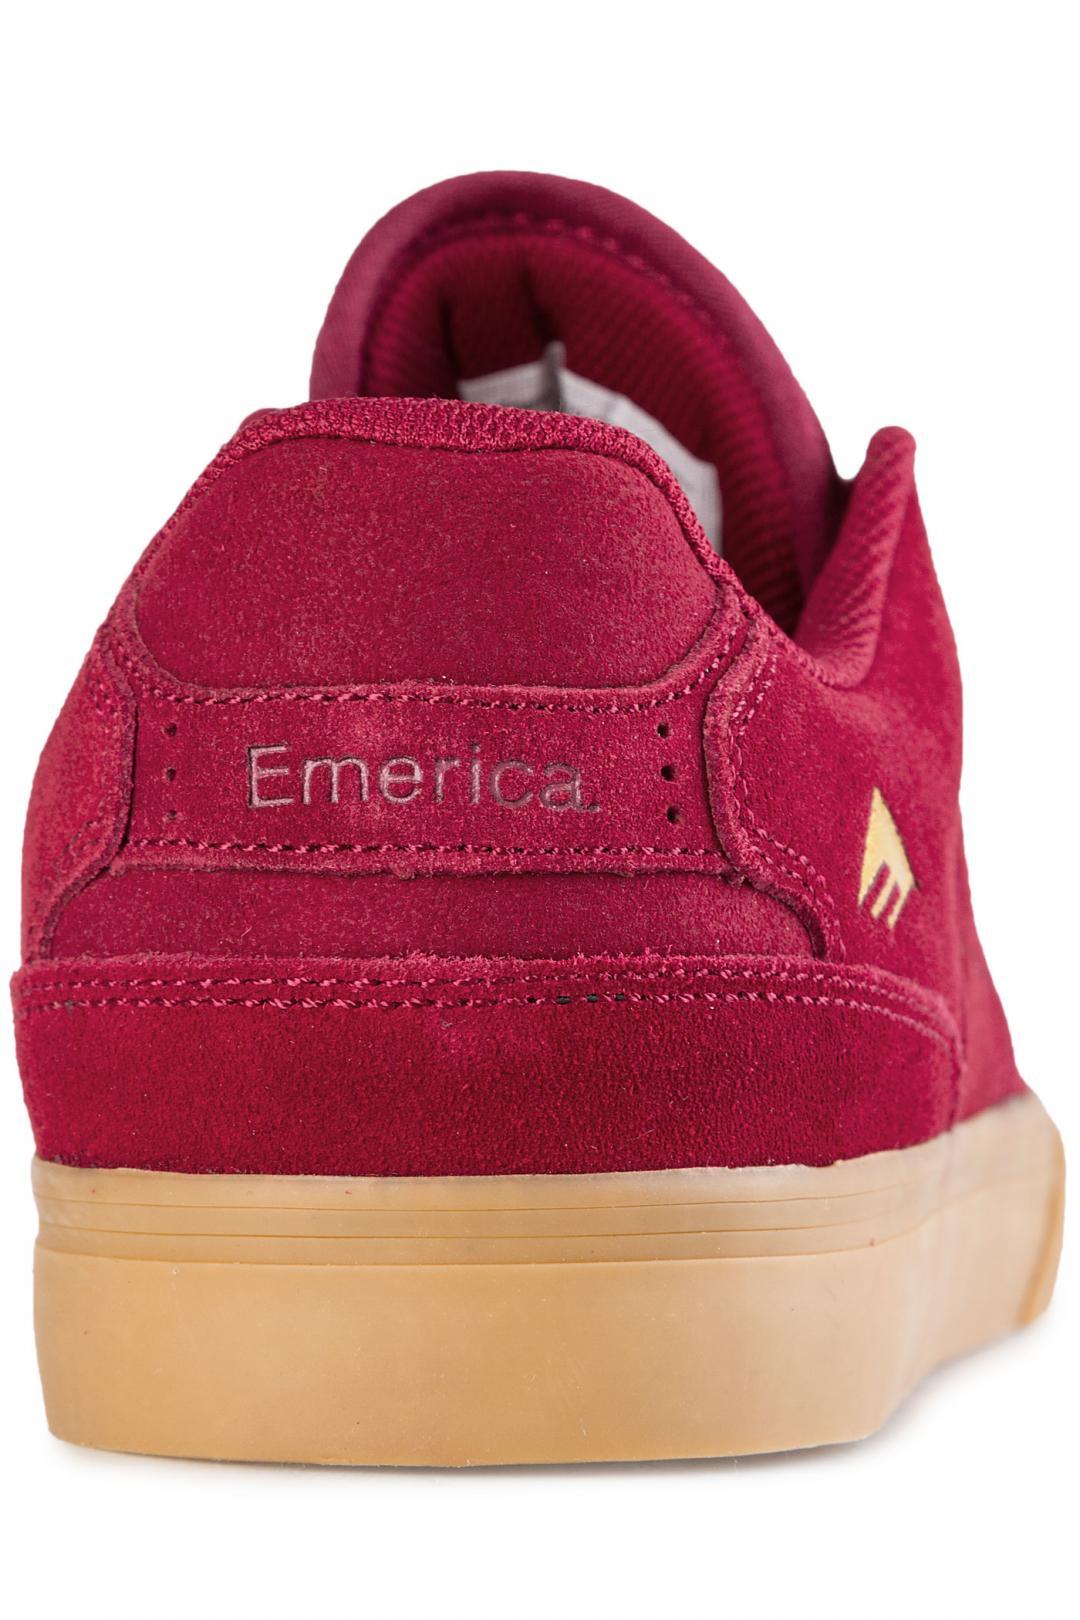 Uomo Emerica The Reynolds Low Vulc burgundy gum | Sneakers low top